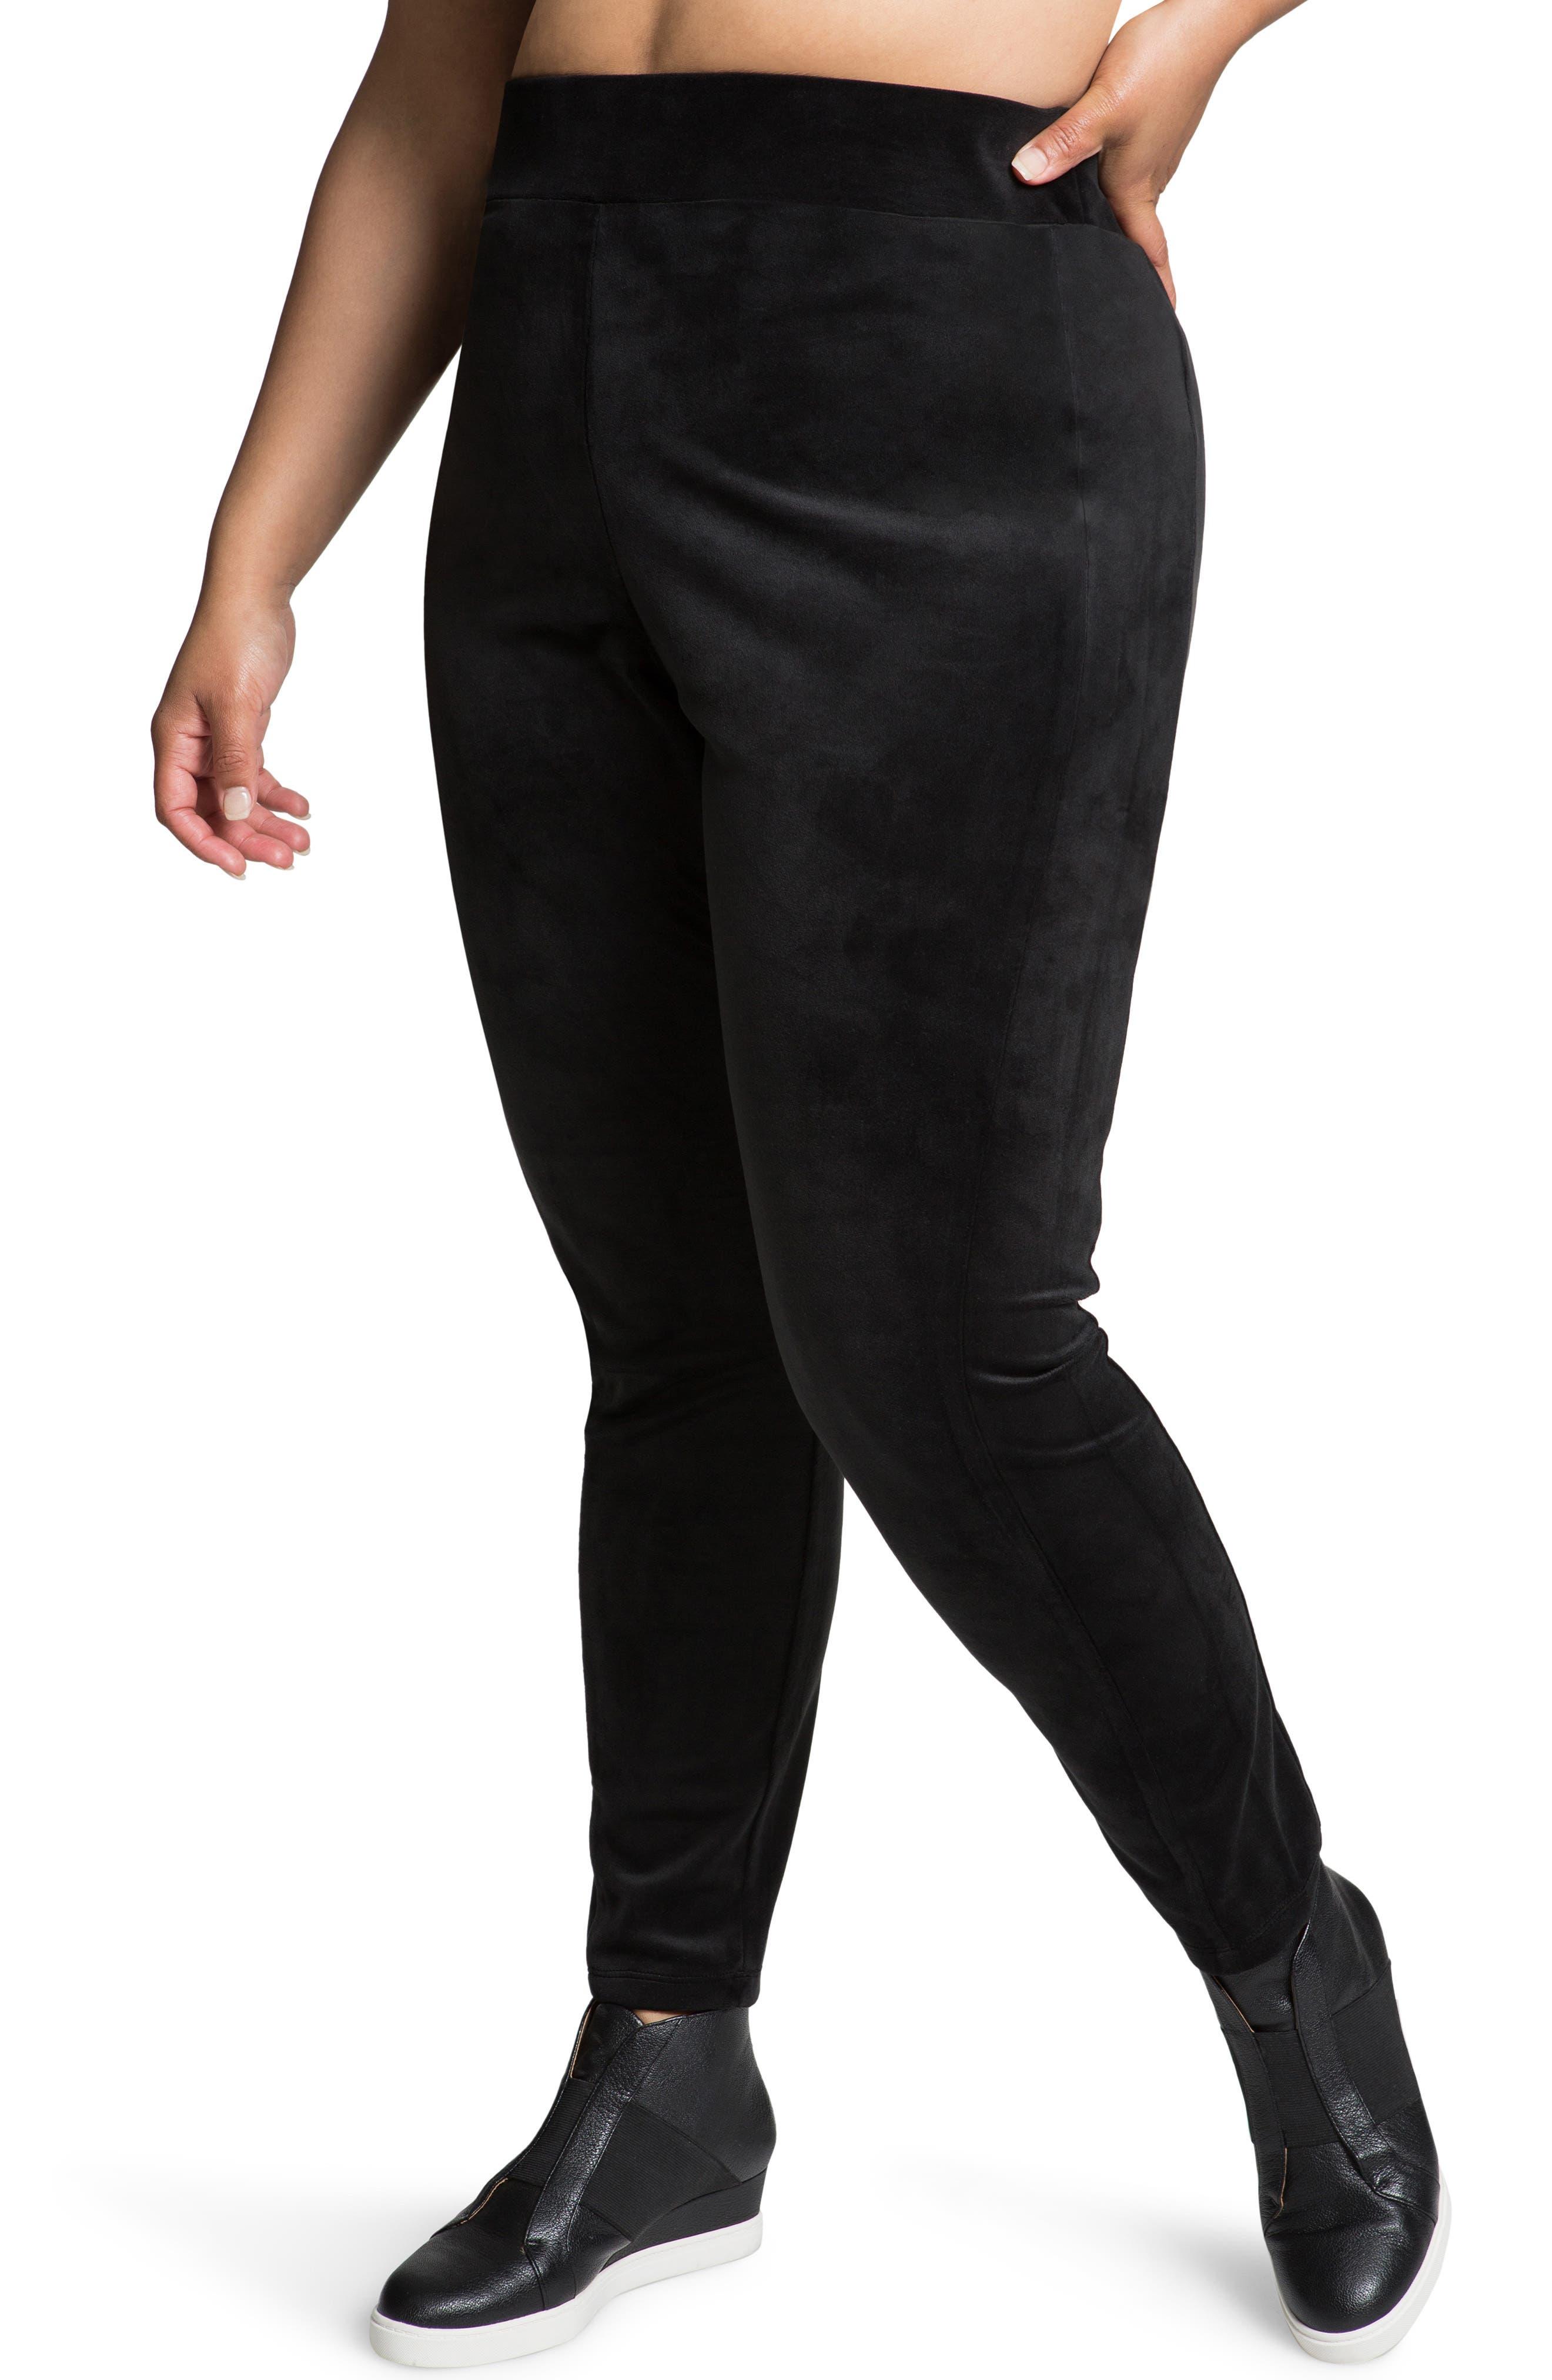 Plus Women's Juicy Couture Velour Leggings